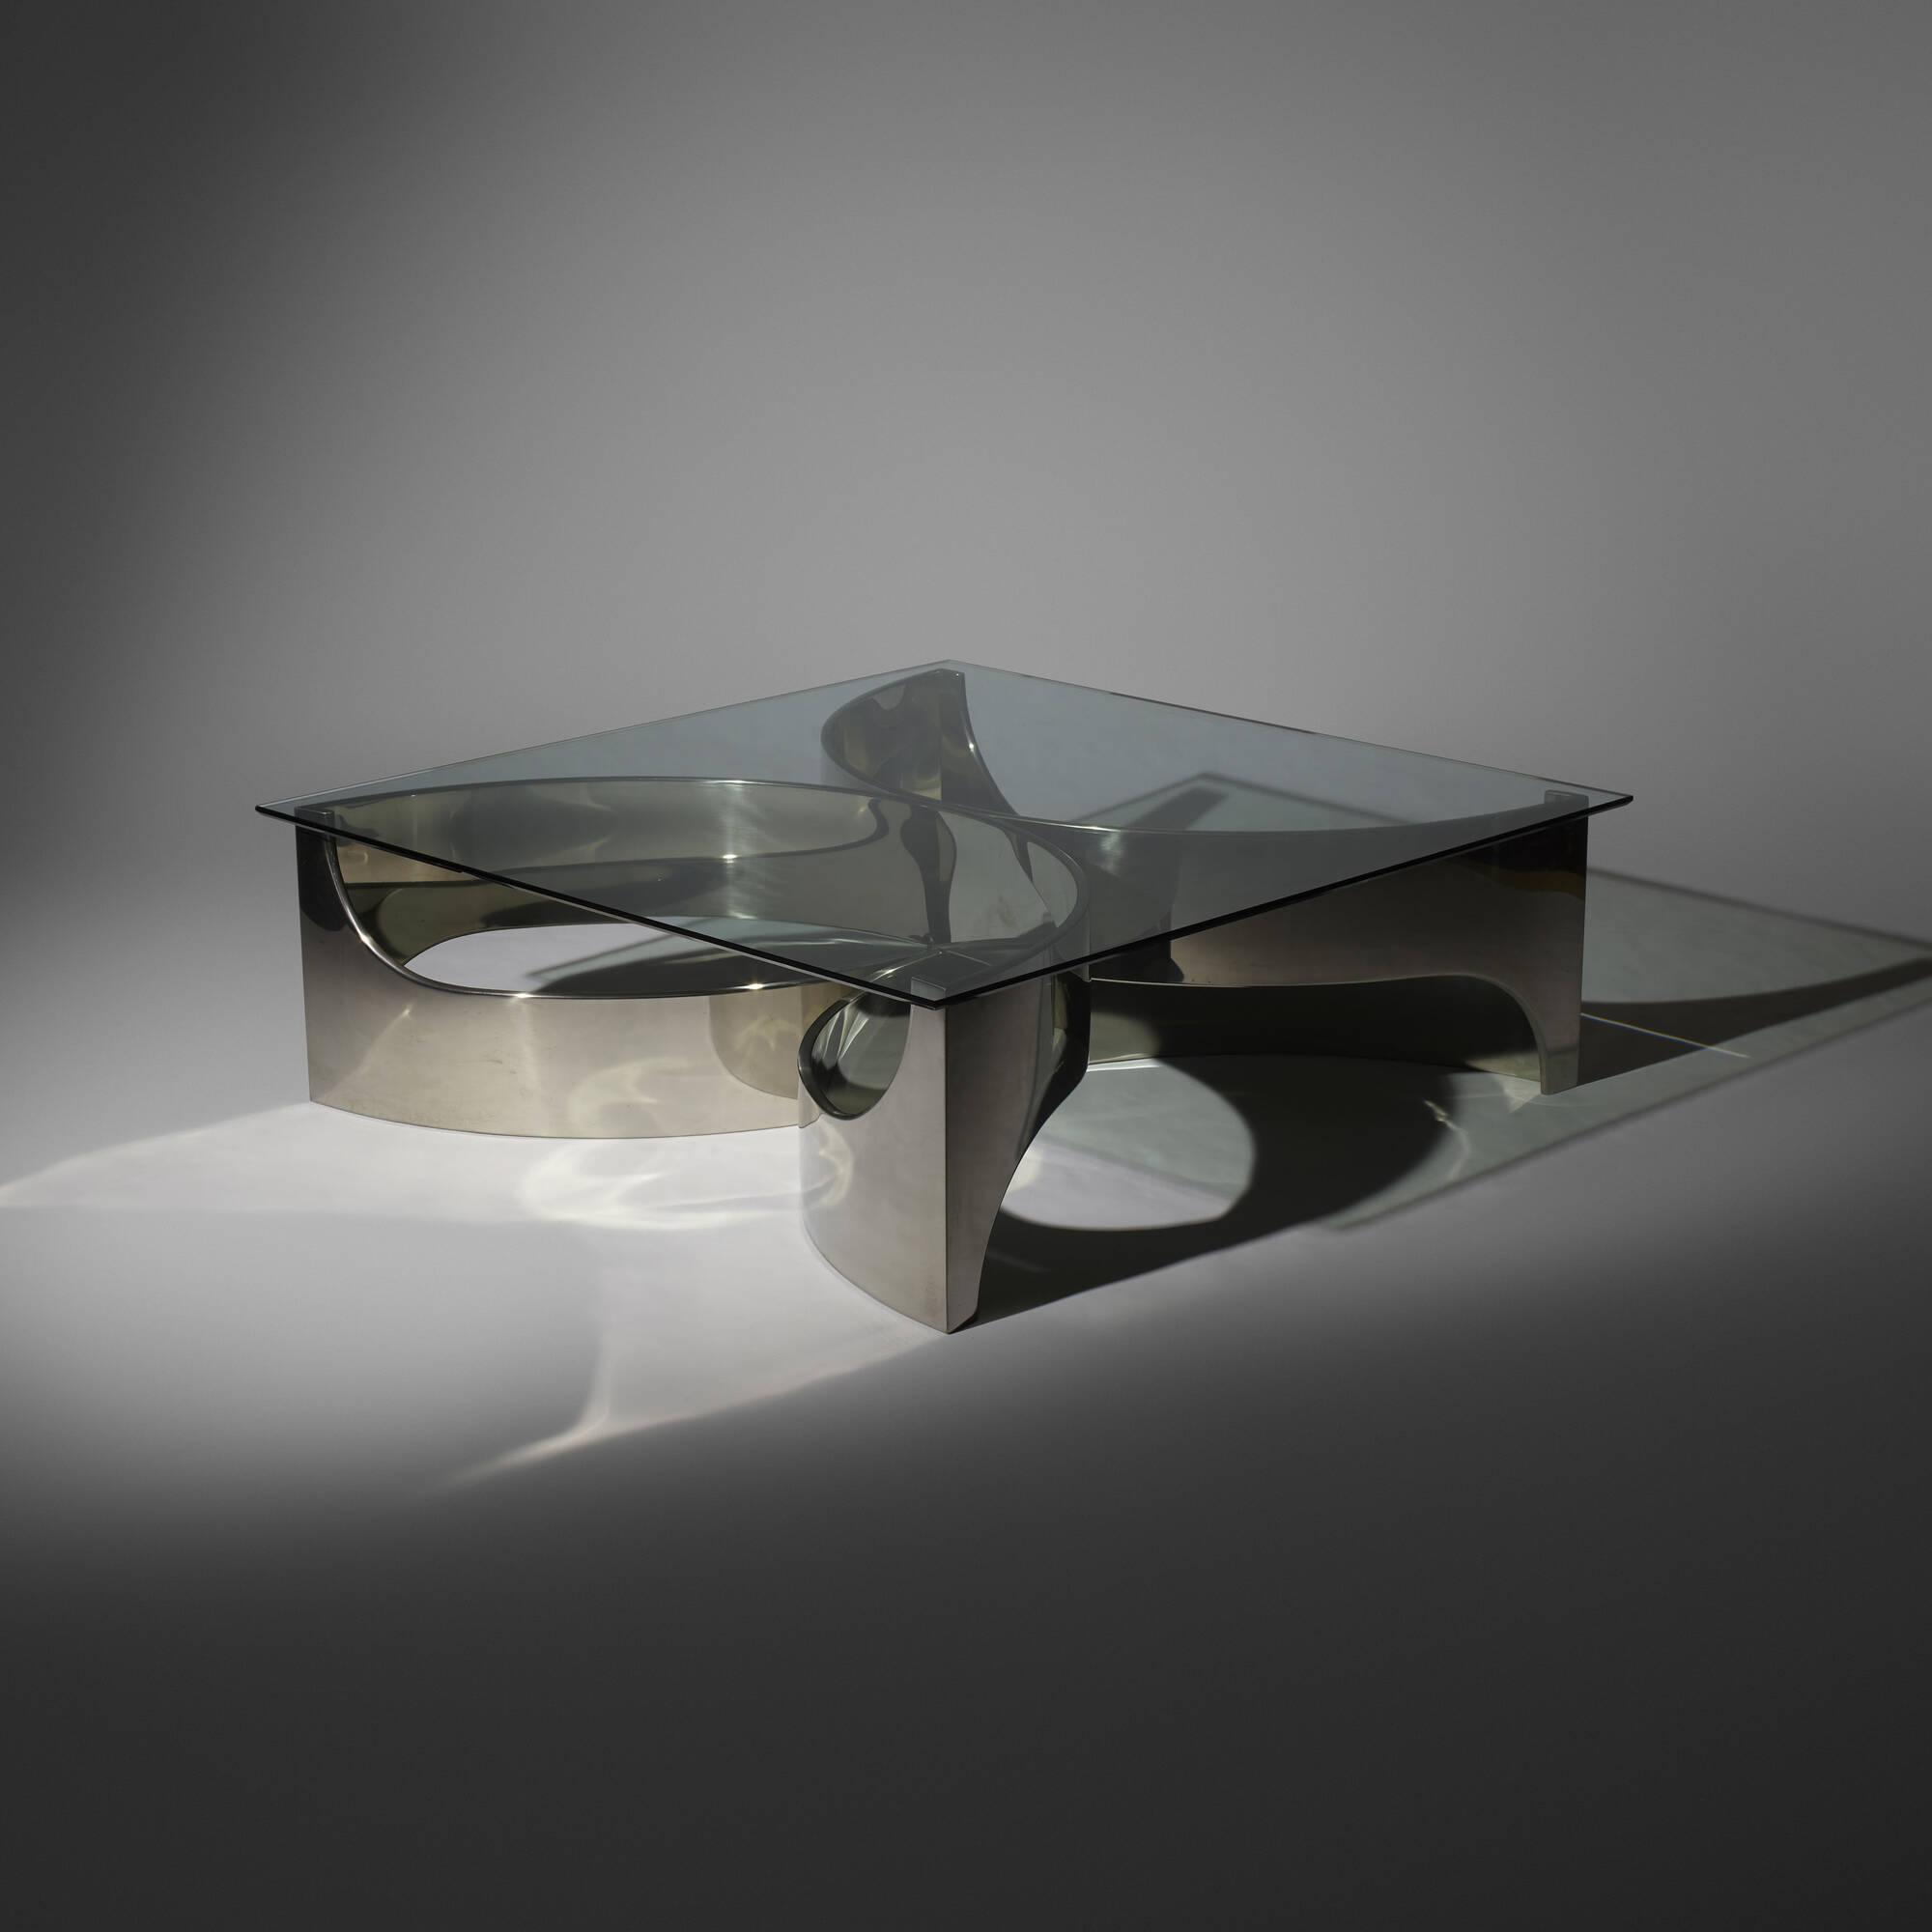 337: Maxform / coffee table (3 of 3)